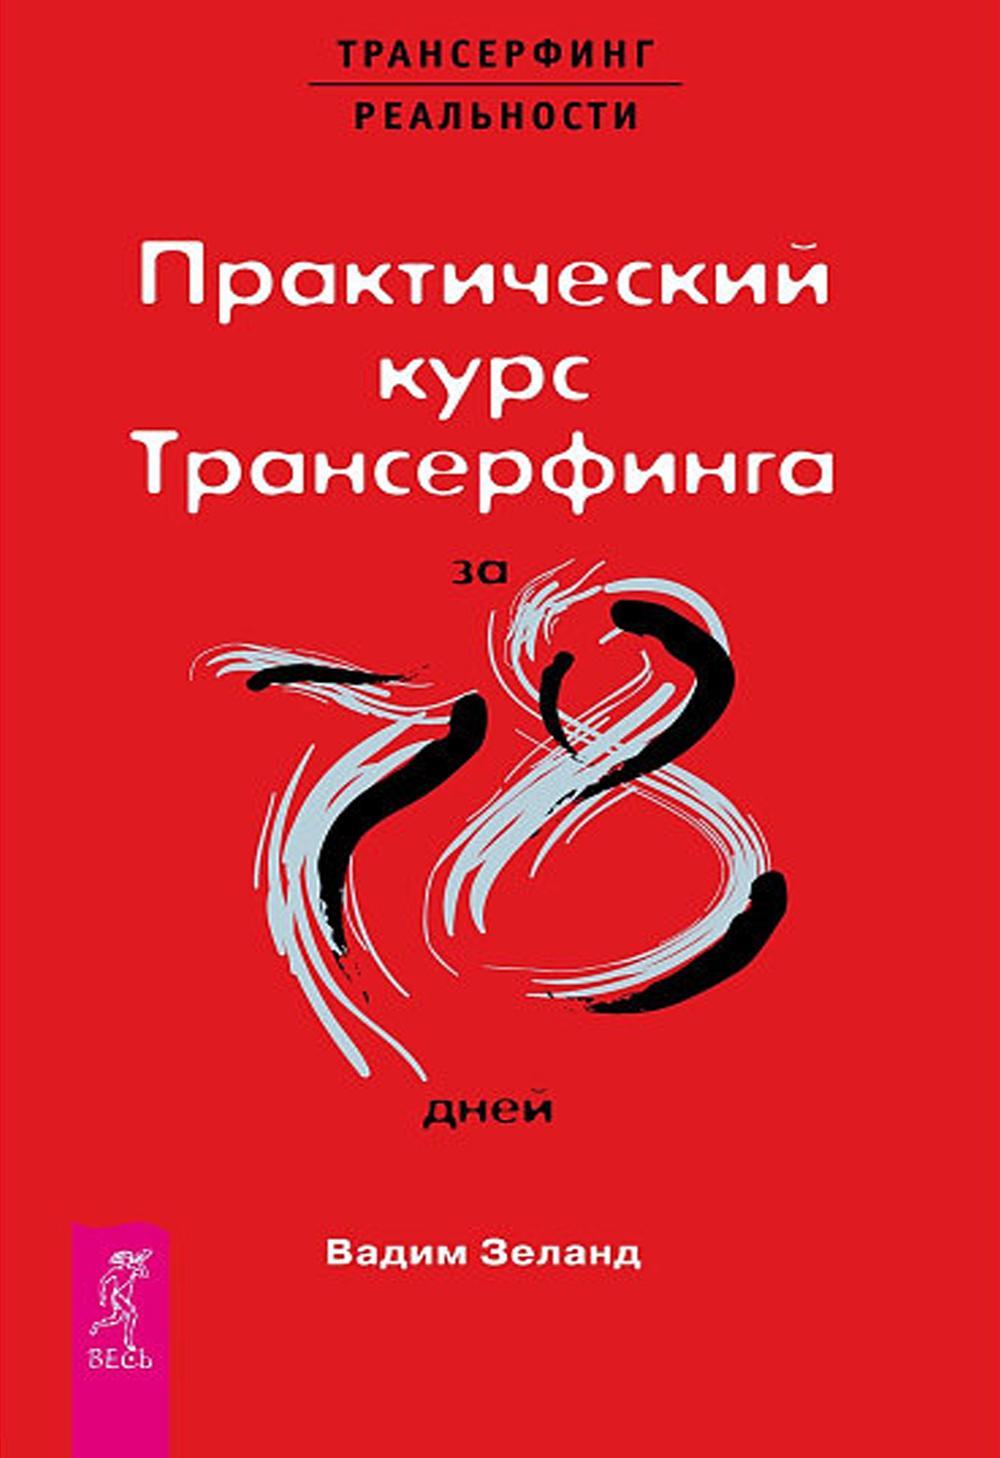 Практический курс Трансерфинга за 78 дней | Вадим Зеланд | Книга и аудиокнига